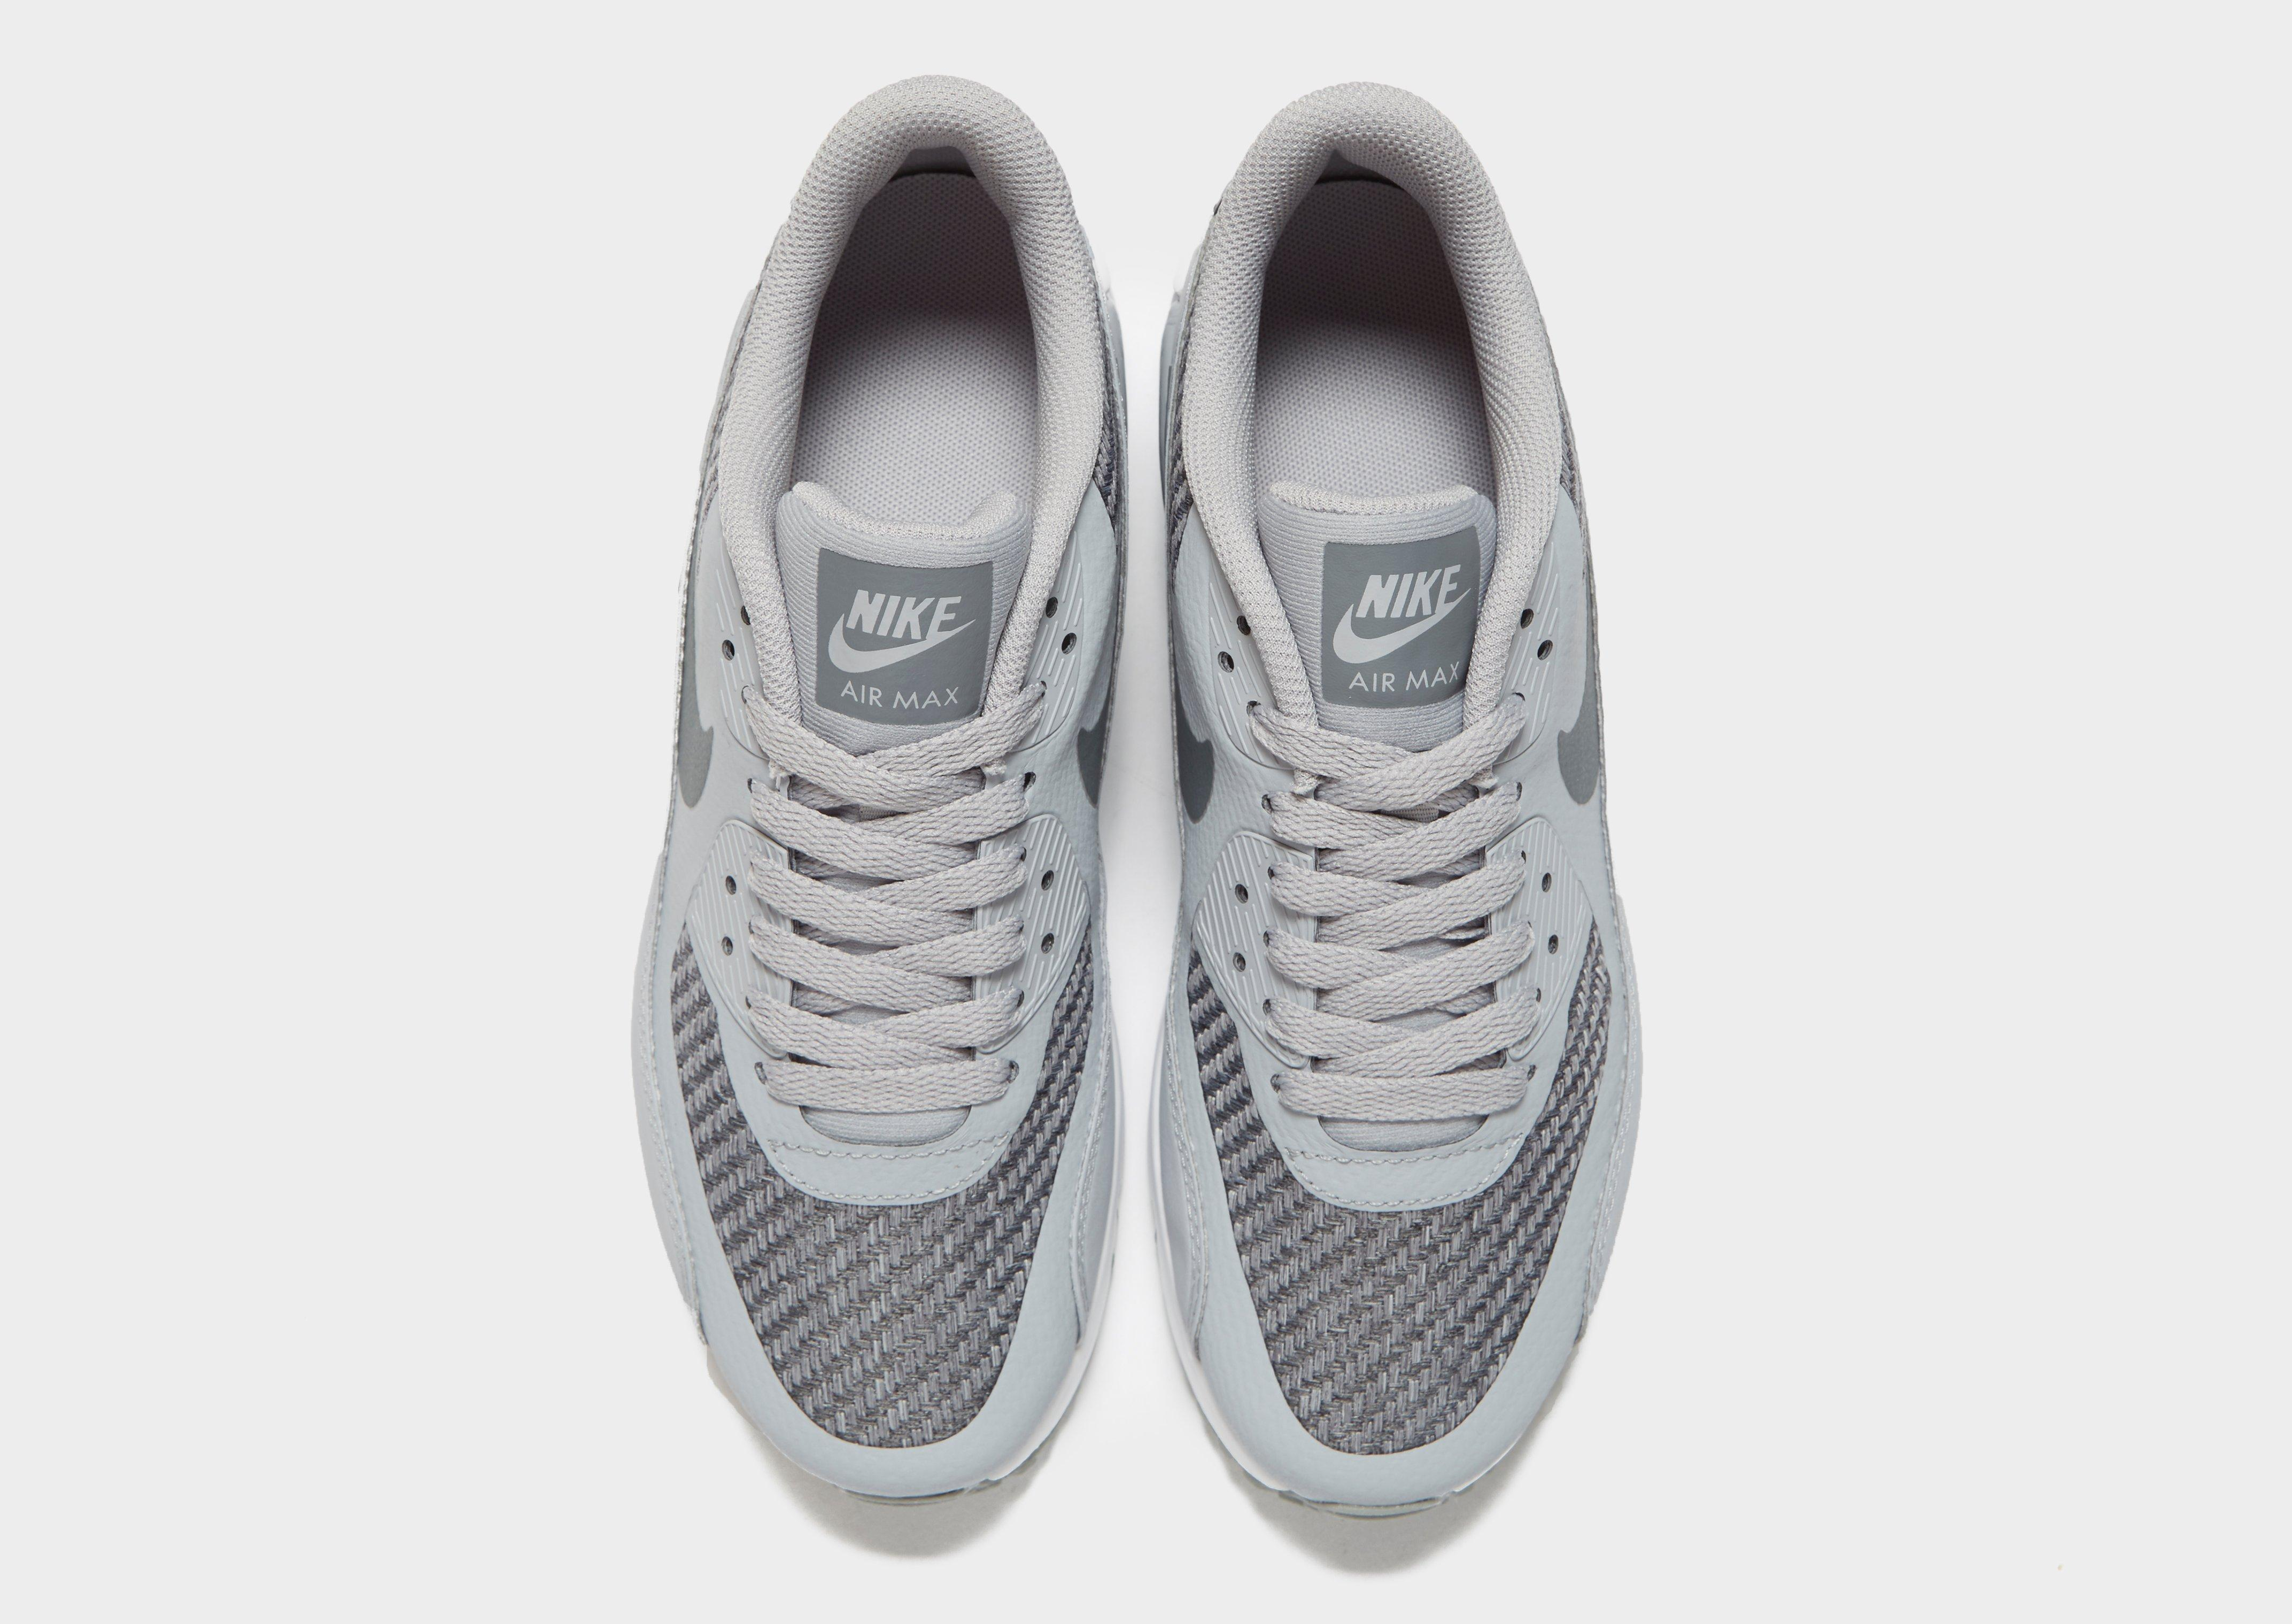 be796fdb0ef8 Nike Free Run Alternatives Xc Shoes